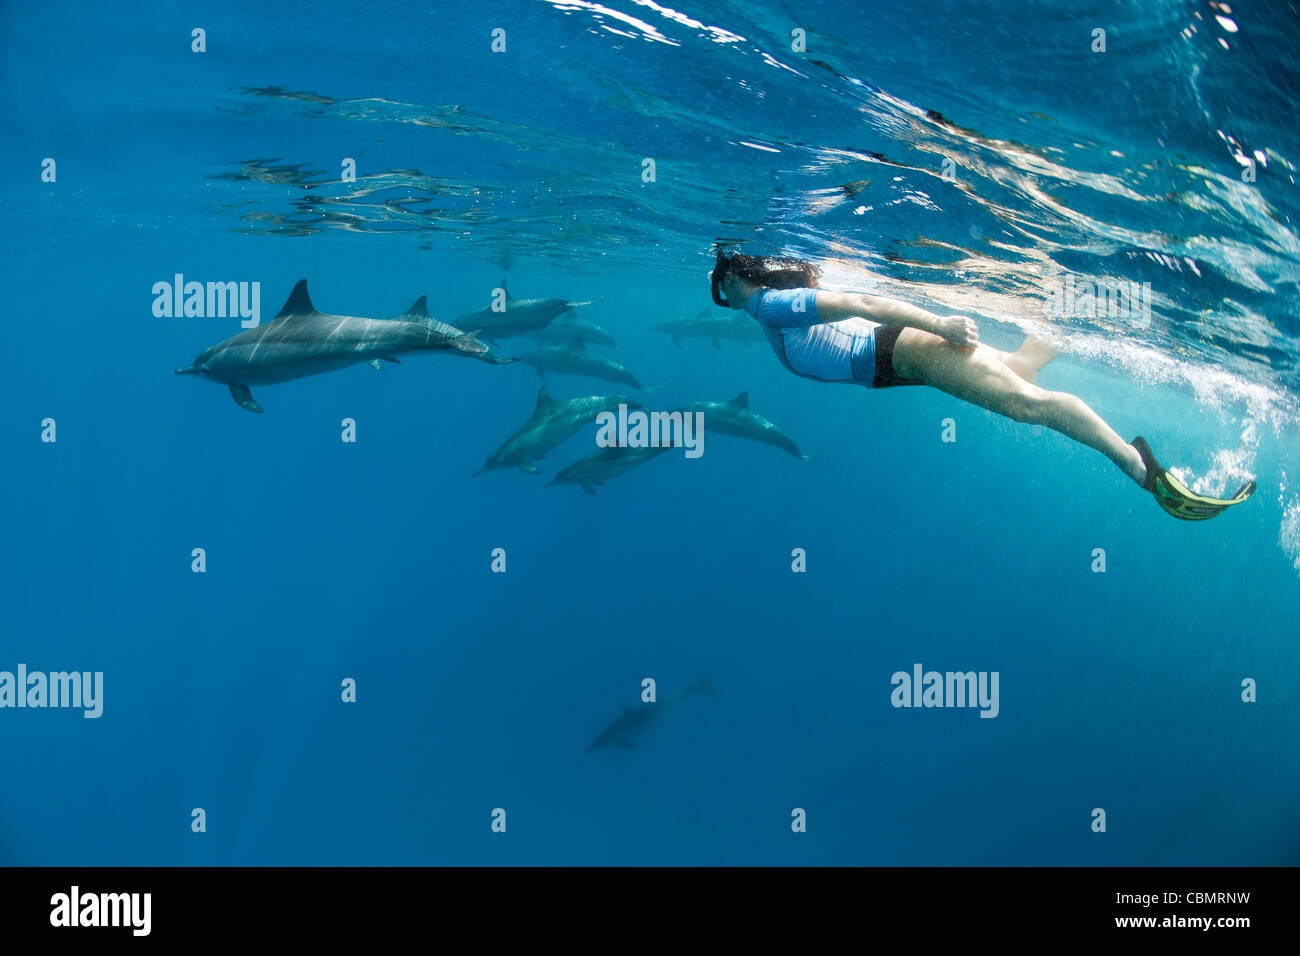 Schnorcheln mit Delfinen, Stenella Longirostris, Shaab Rumi, Rotes Meer, Sudan Stockfoto